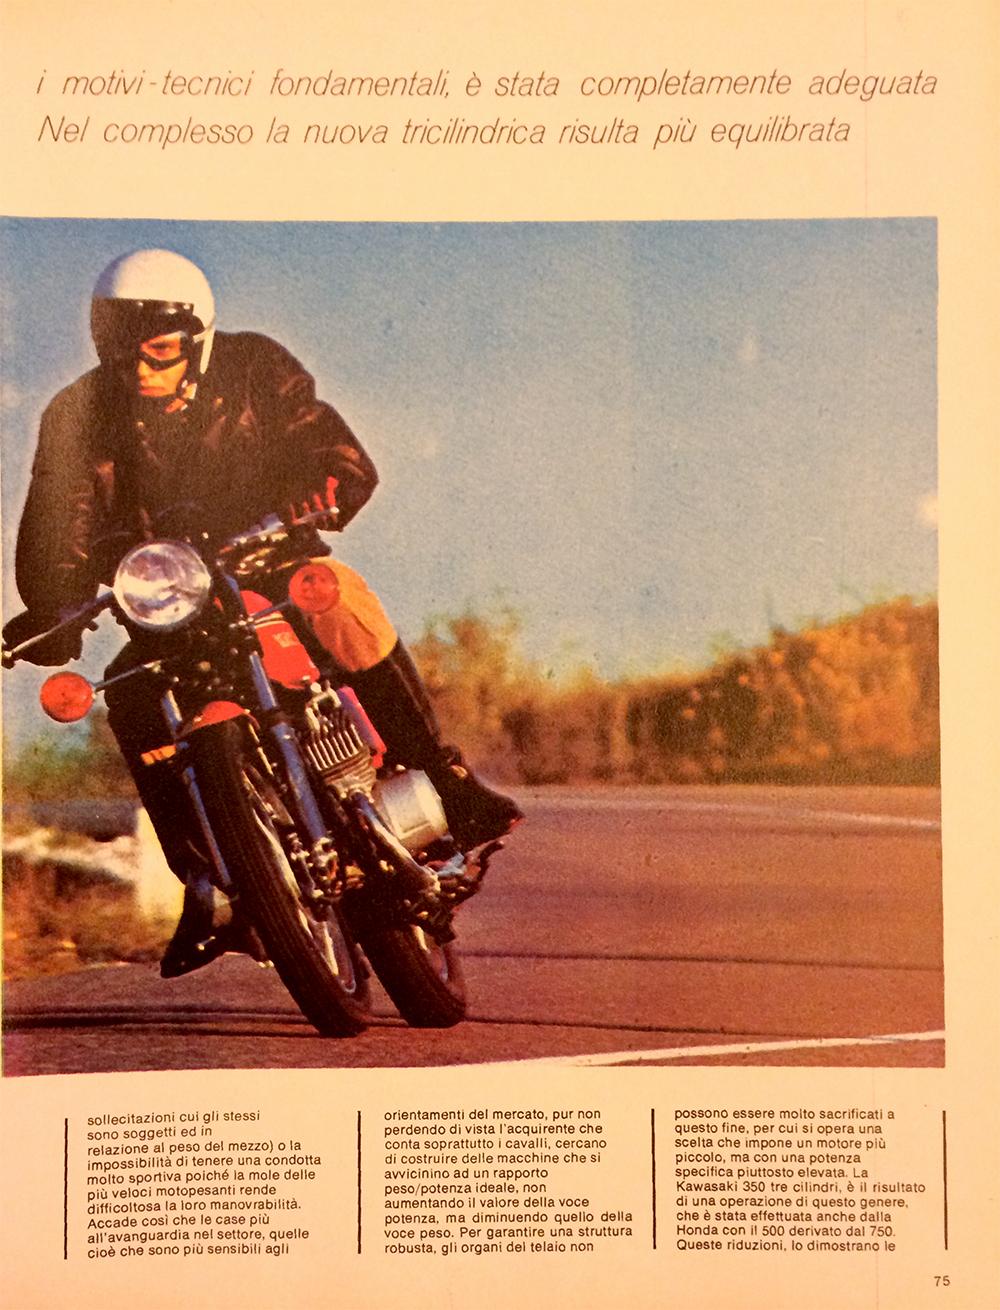 1971 Kawasaki 350 S2 Italy road test 03.jpg